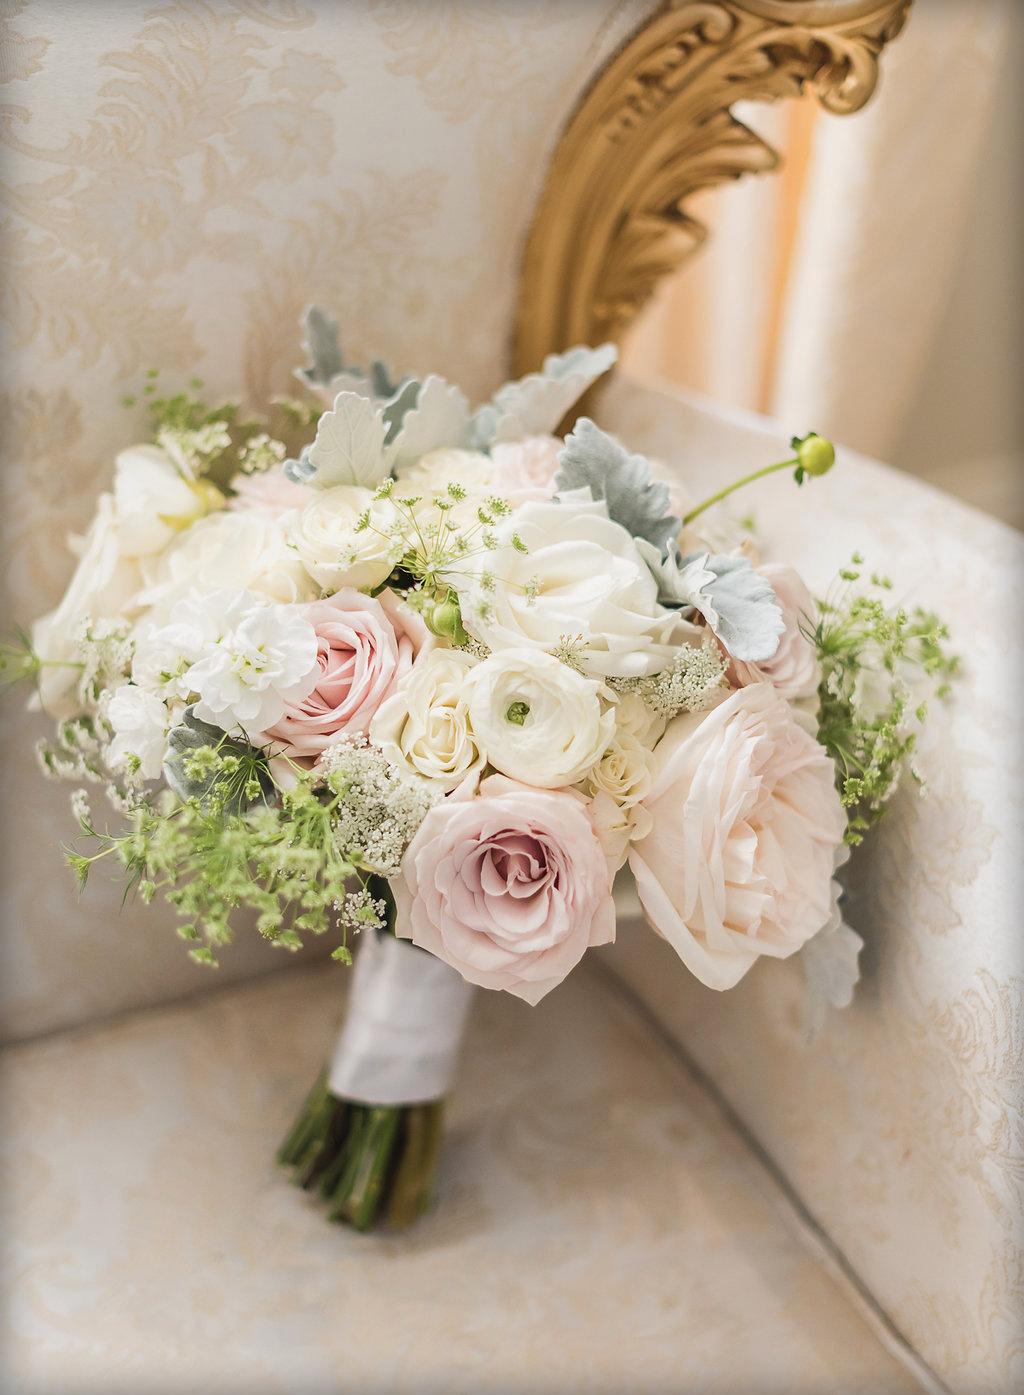 Blush & white bridal bouquet : Jackie Averill Photography